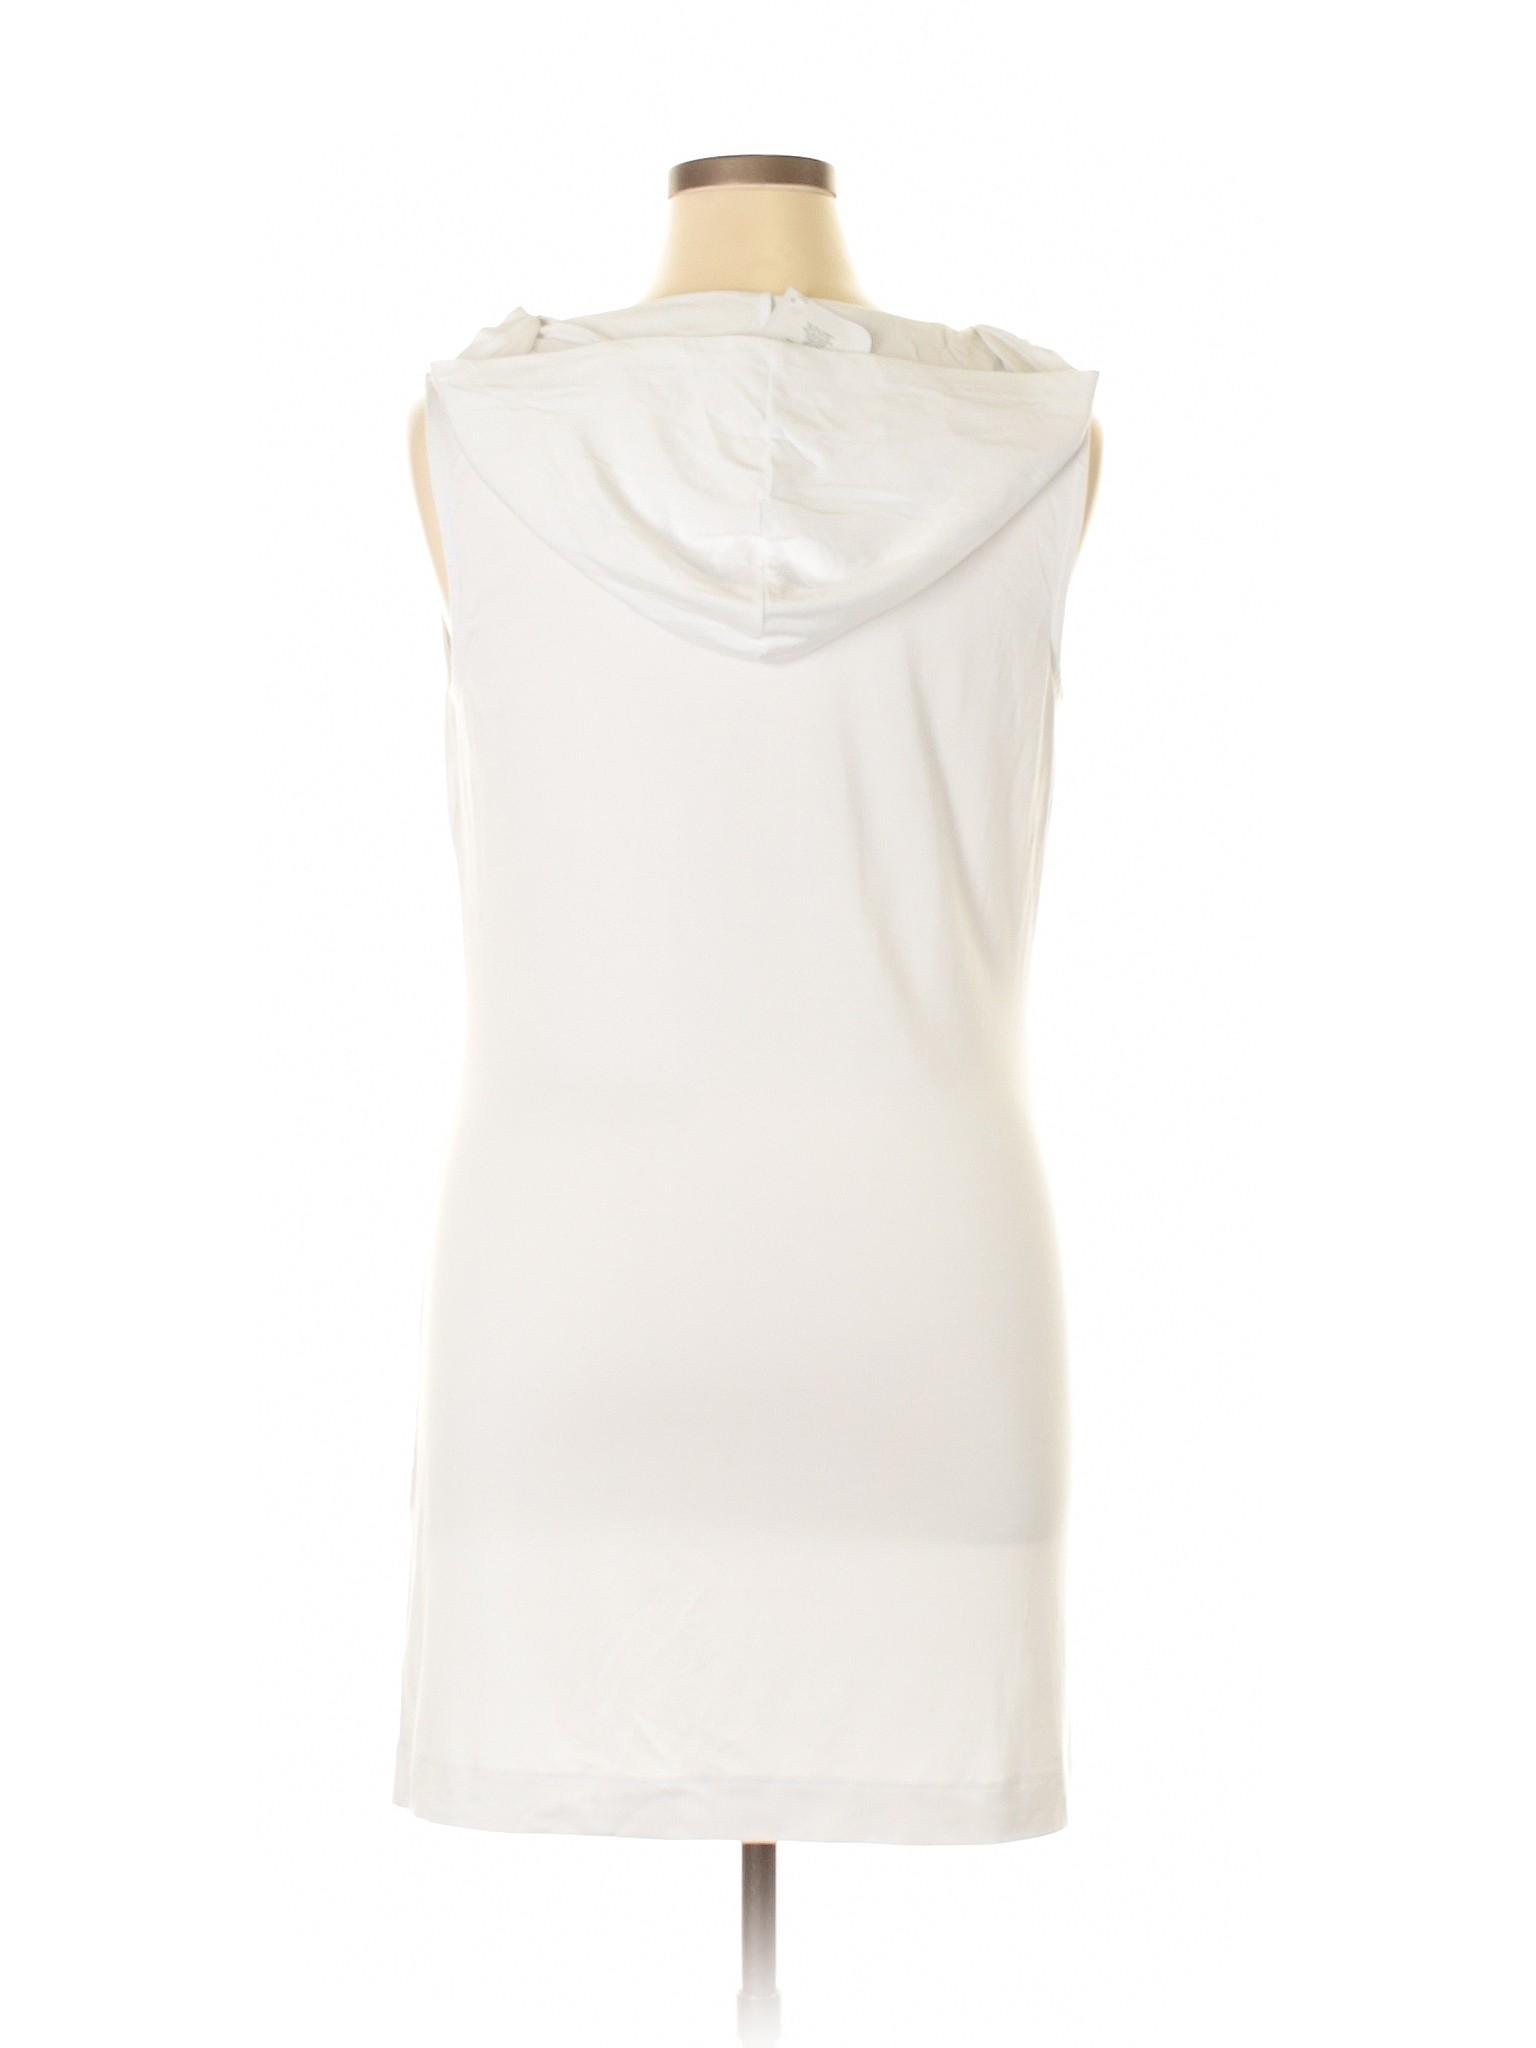 winter Boutique winter Casual Casual Dress Fabletics Fabletics Boutique Boutique winter Dress Fabletics C5Aqx4w